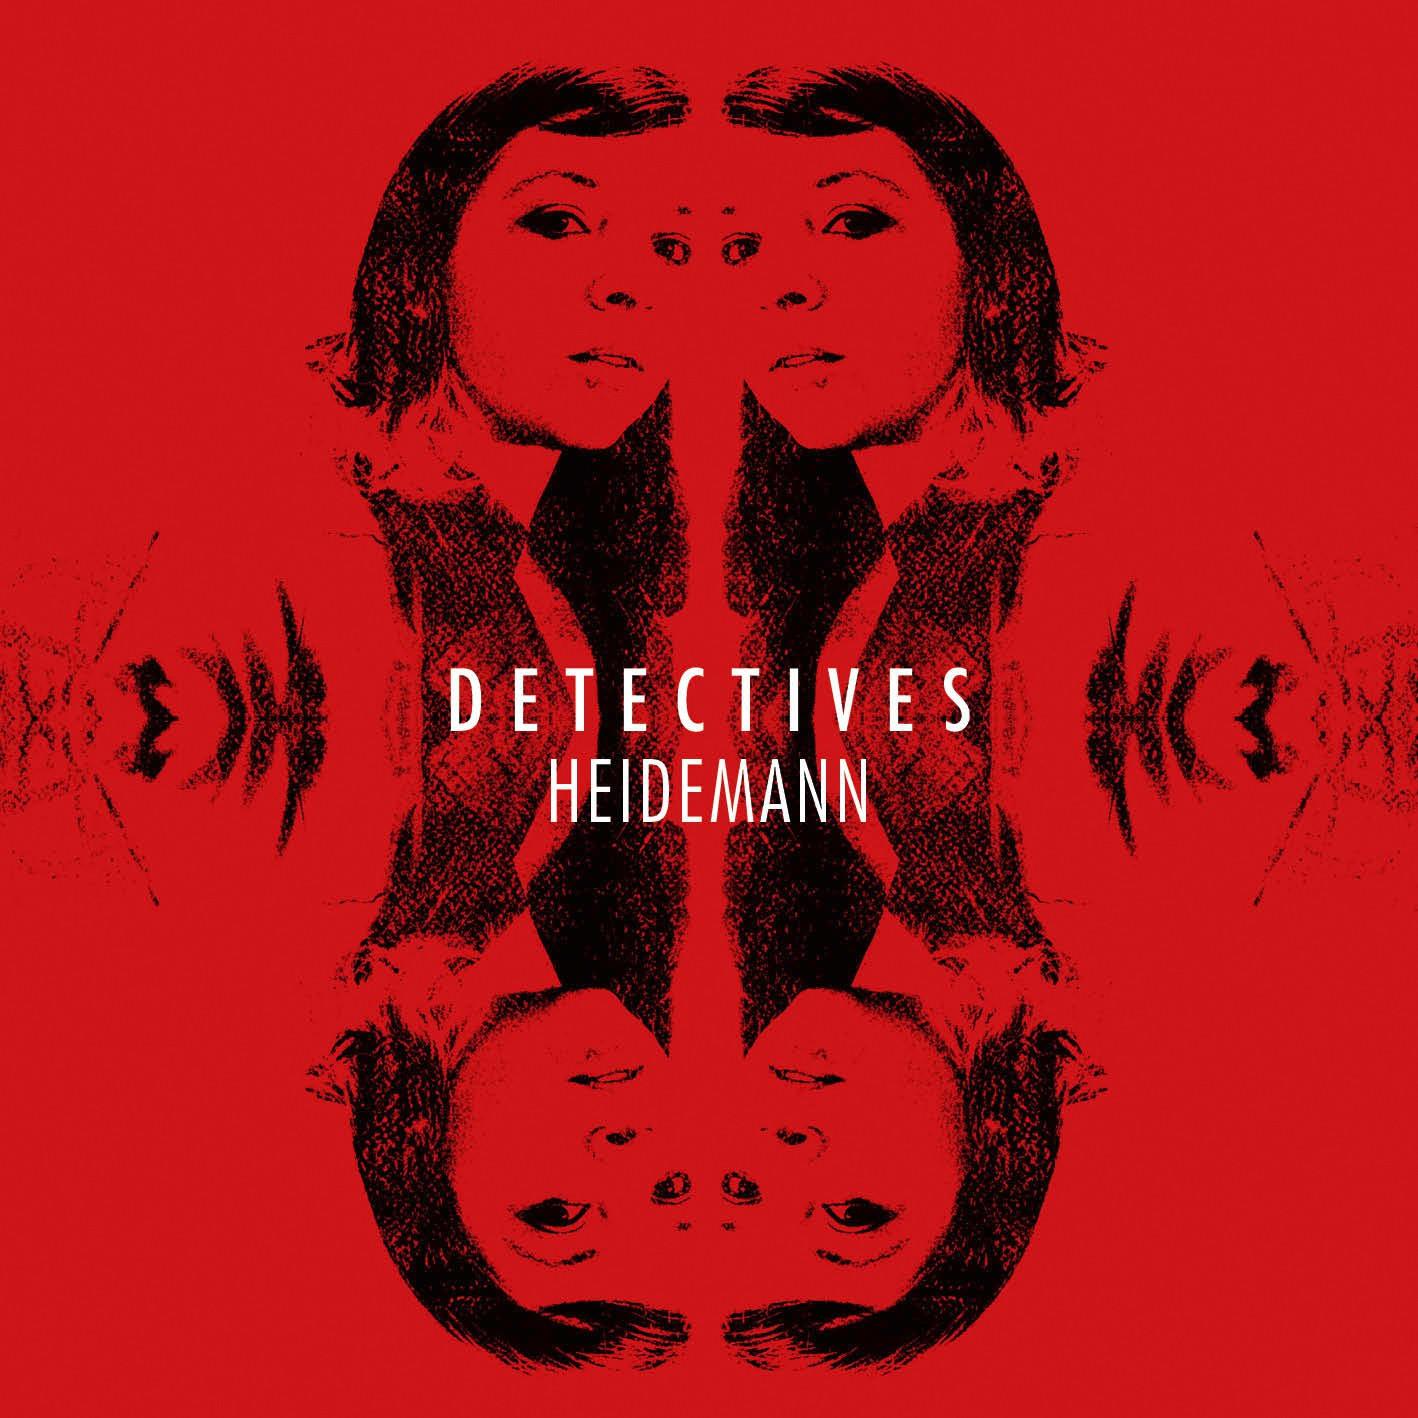 heidemann detectives ep HEIDEMANN premiere throbbing new single Last Chance    listen